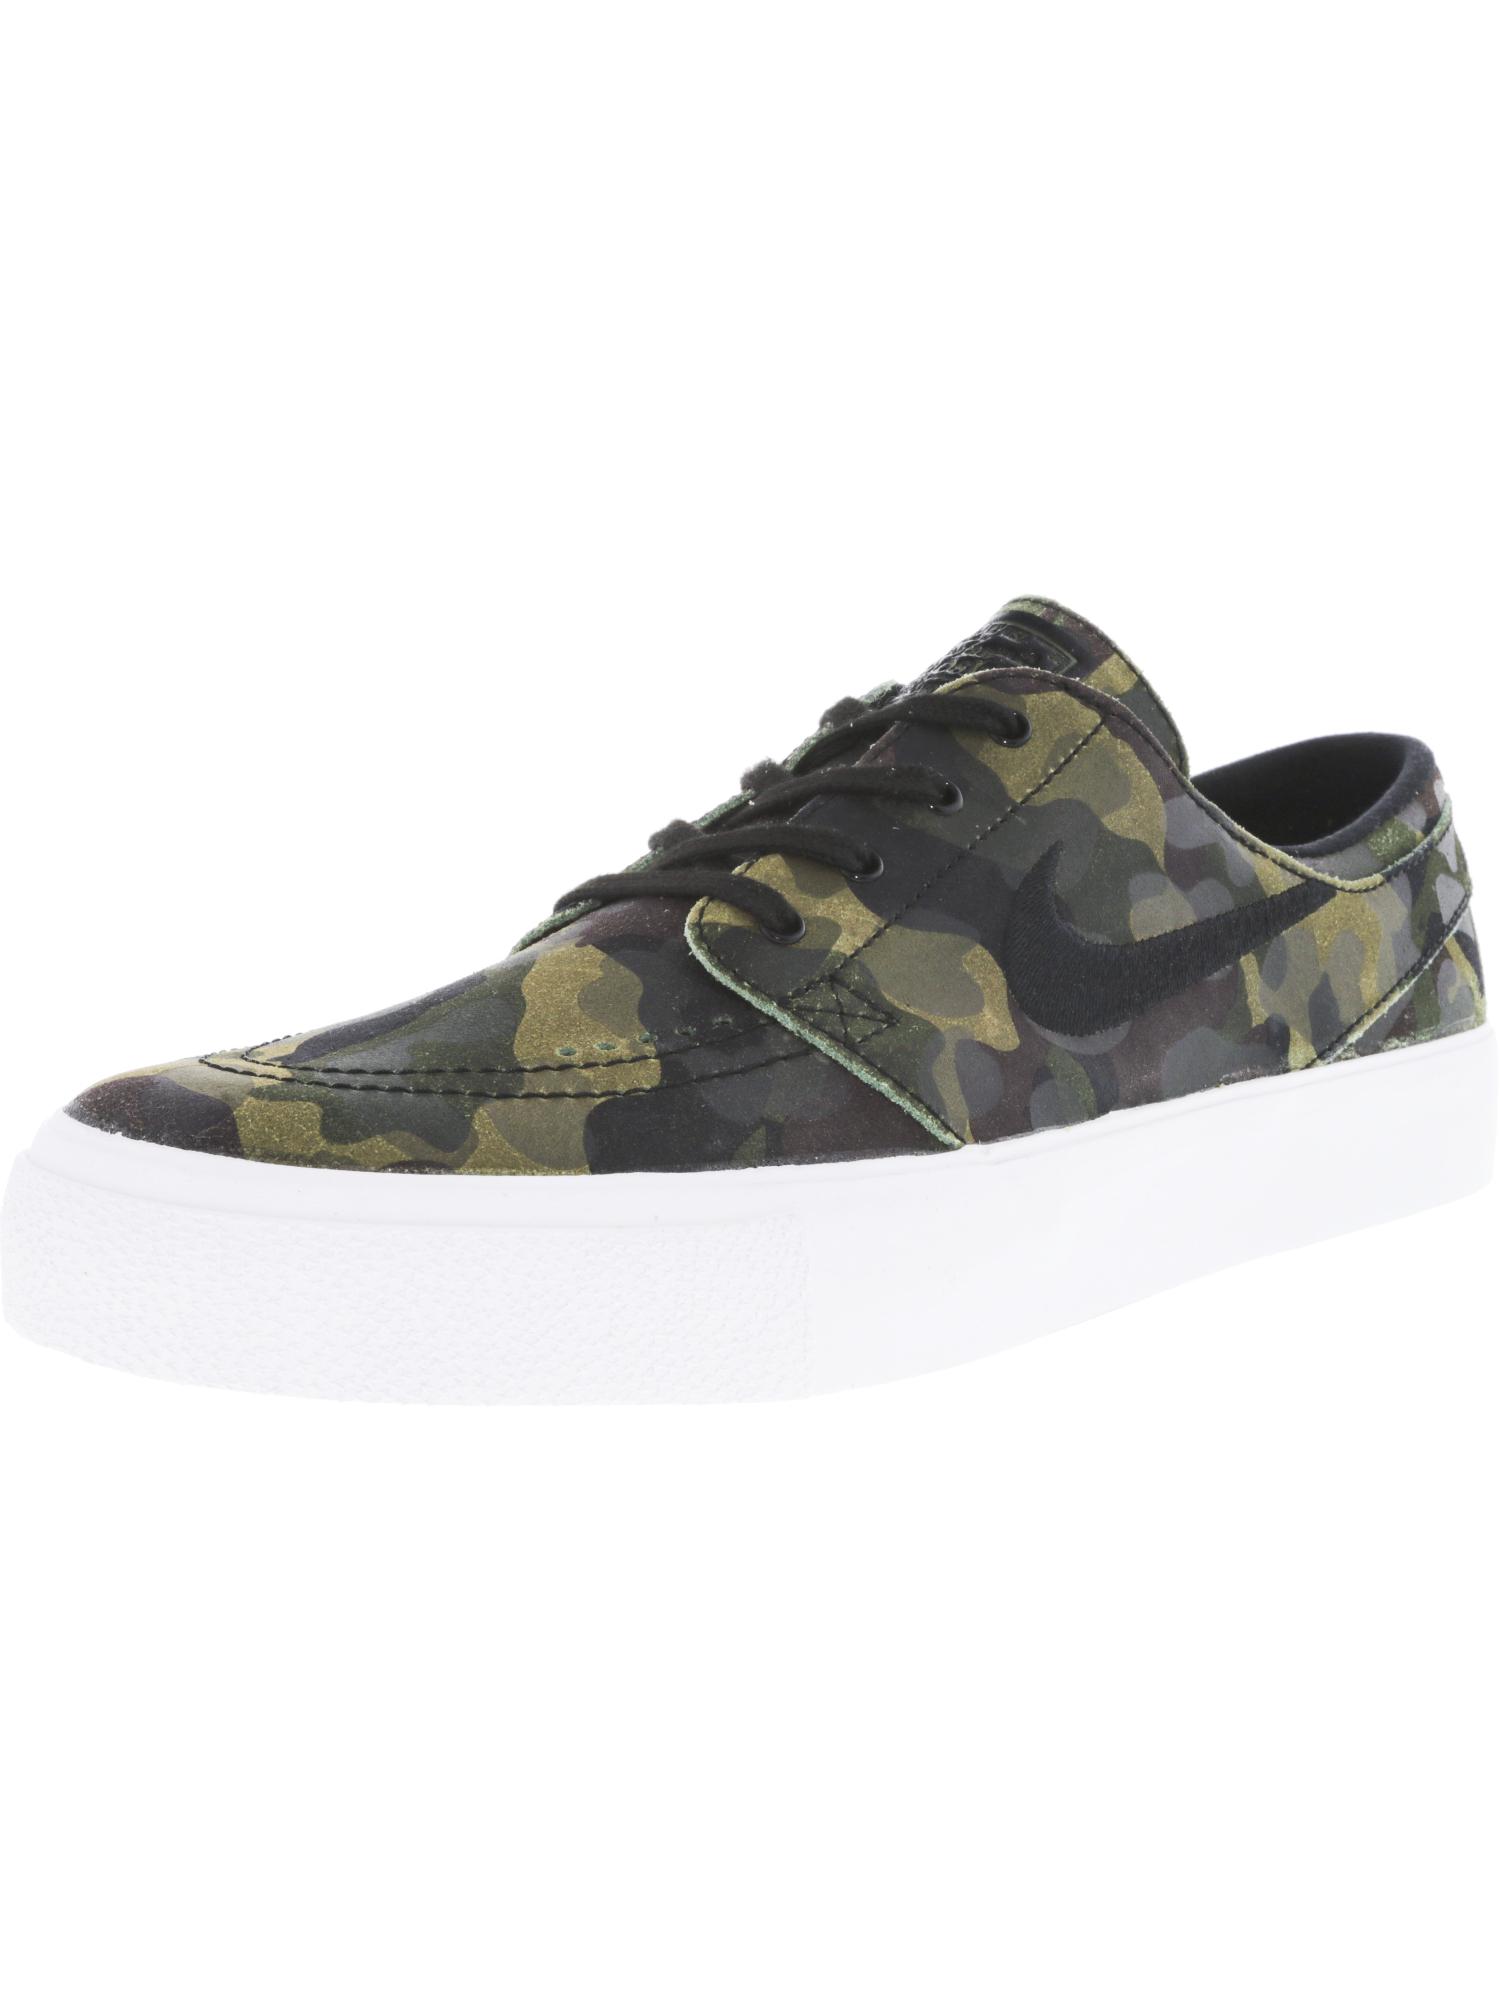 Nike homme Zoom Stefan Janoski Prem Ht faible Chaussure Top Suede Skateboarding Chaussure faible 530c86